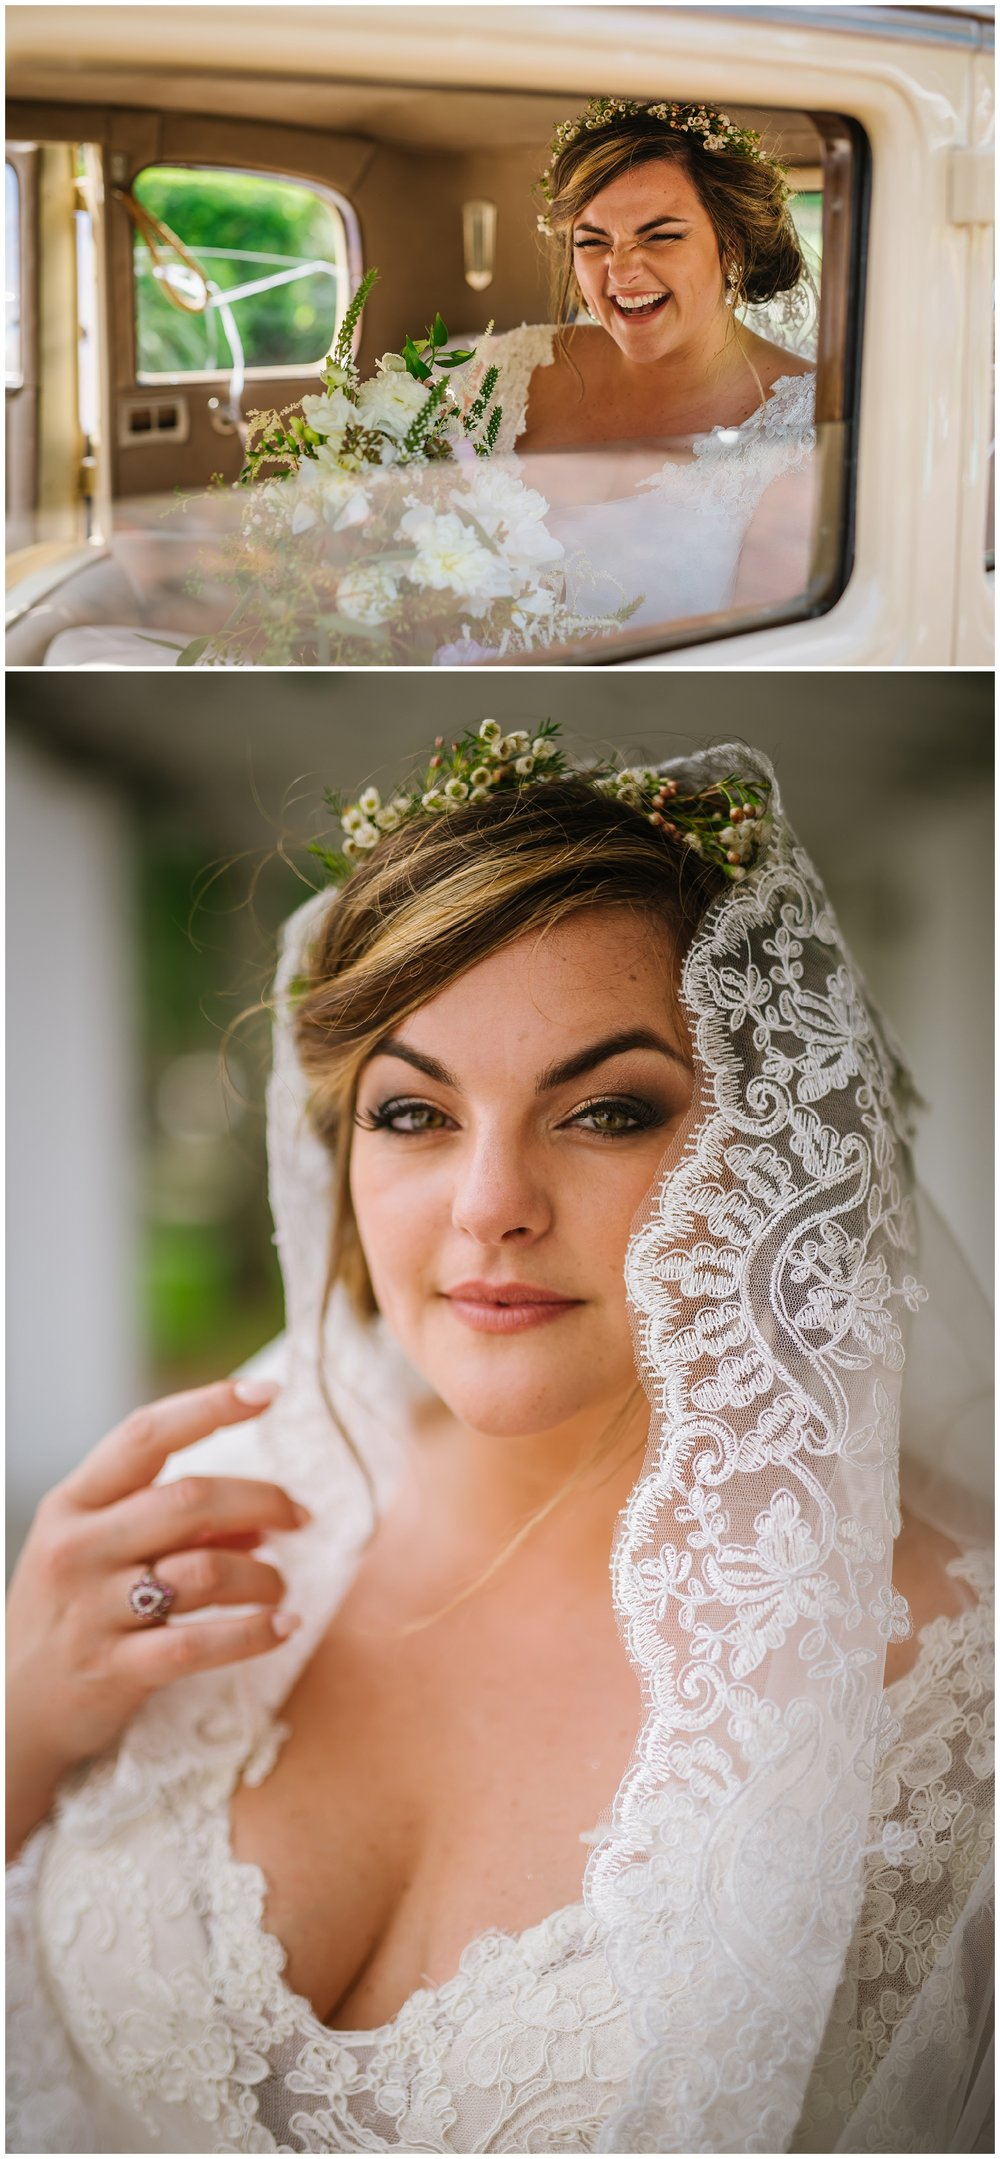 Ashlee-hamon-photography-year-in-review-2016-travel-wanderlust-vsco-adventure-wedding_0018.jpg